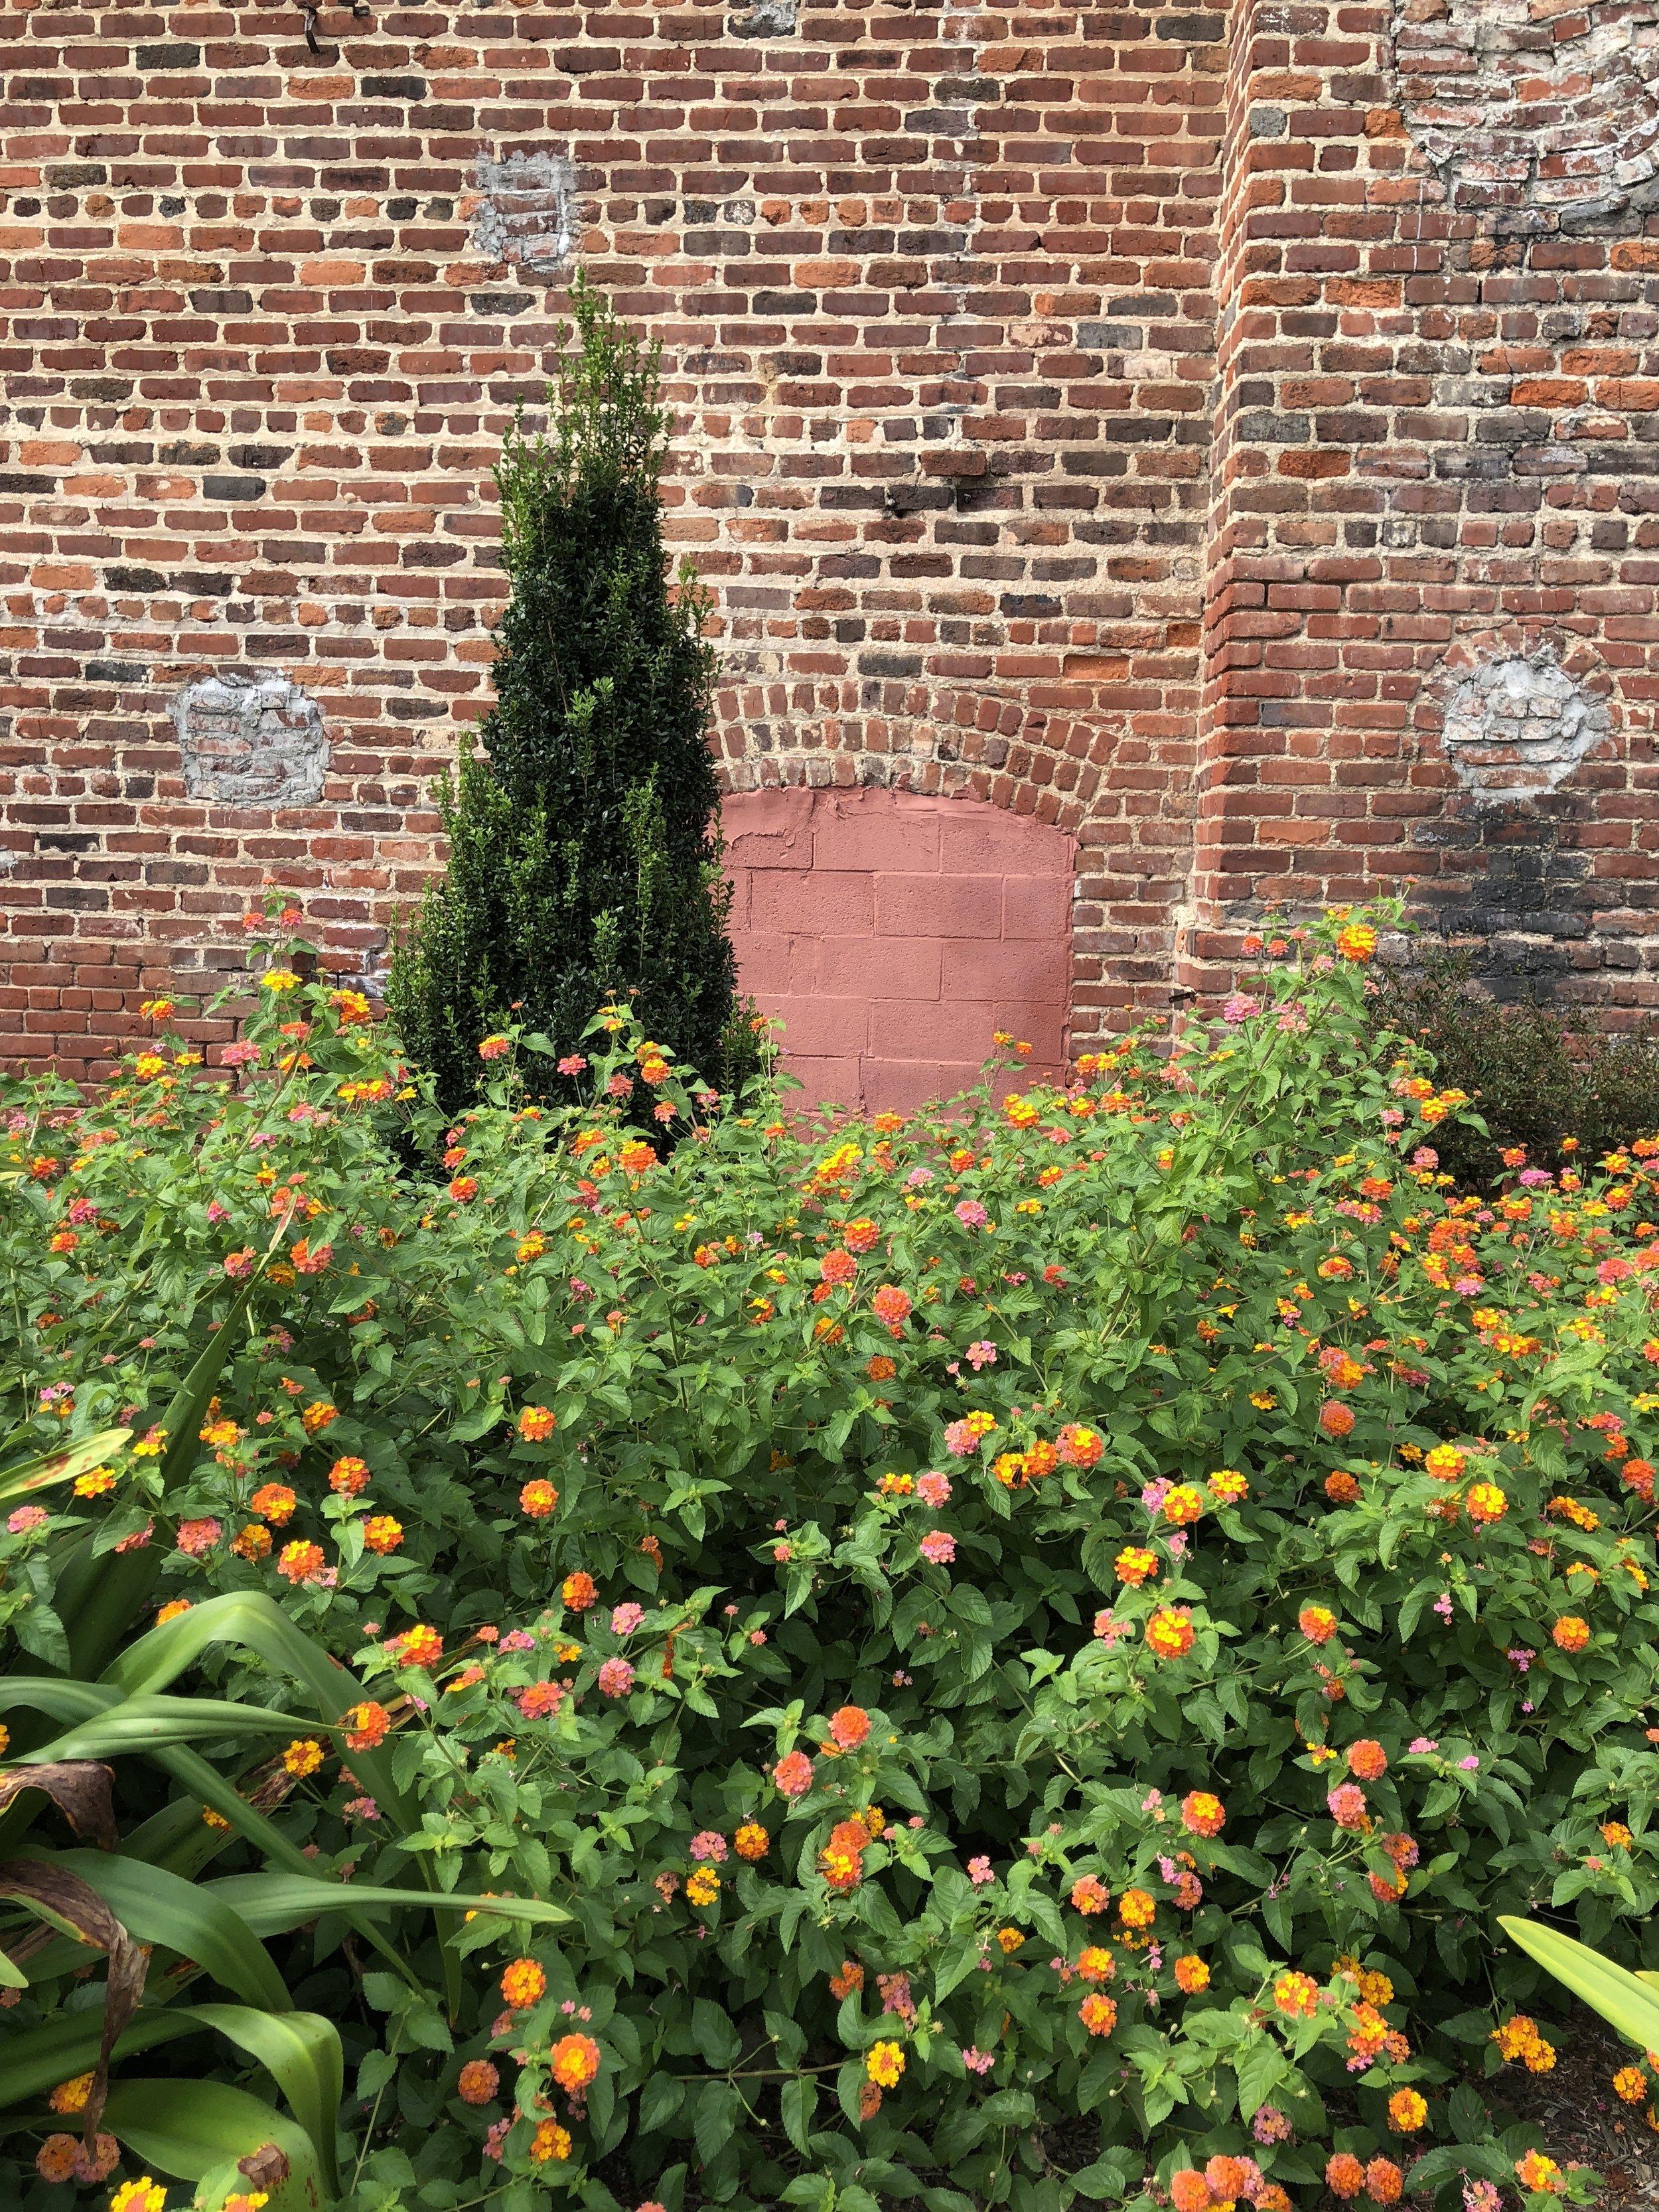 Glimsen-lantana-brick-wall.JPG